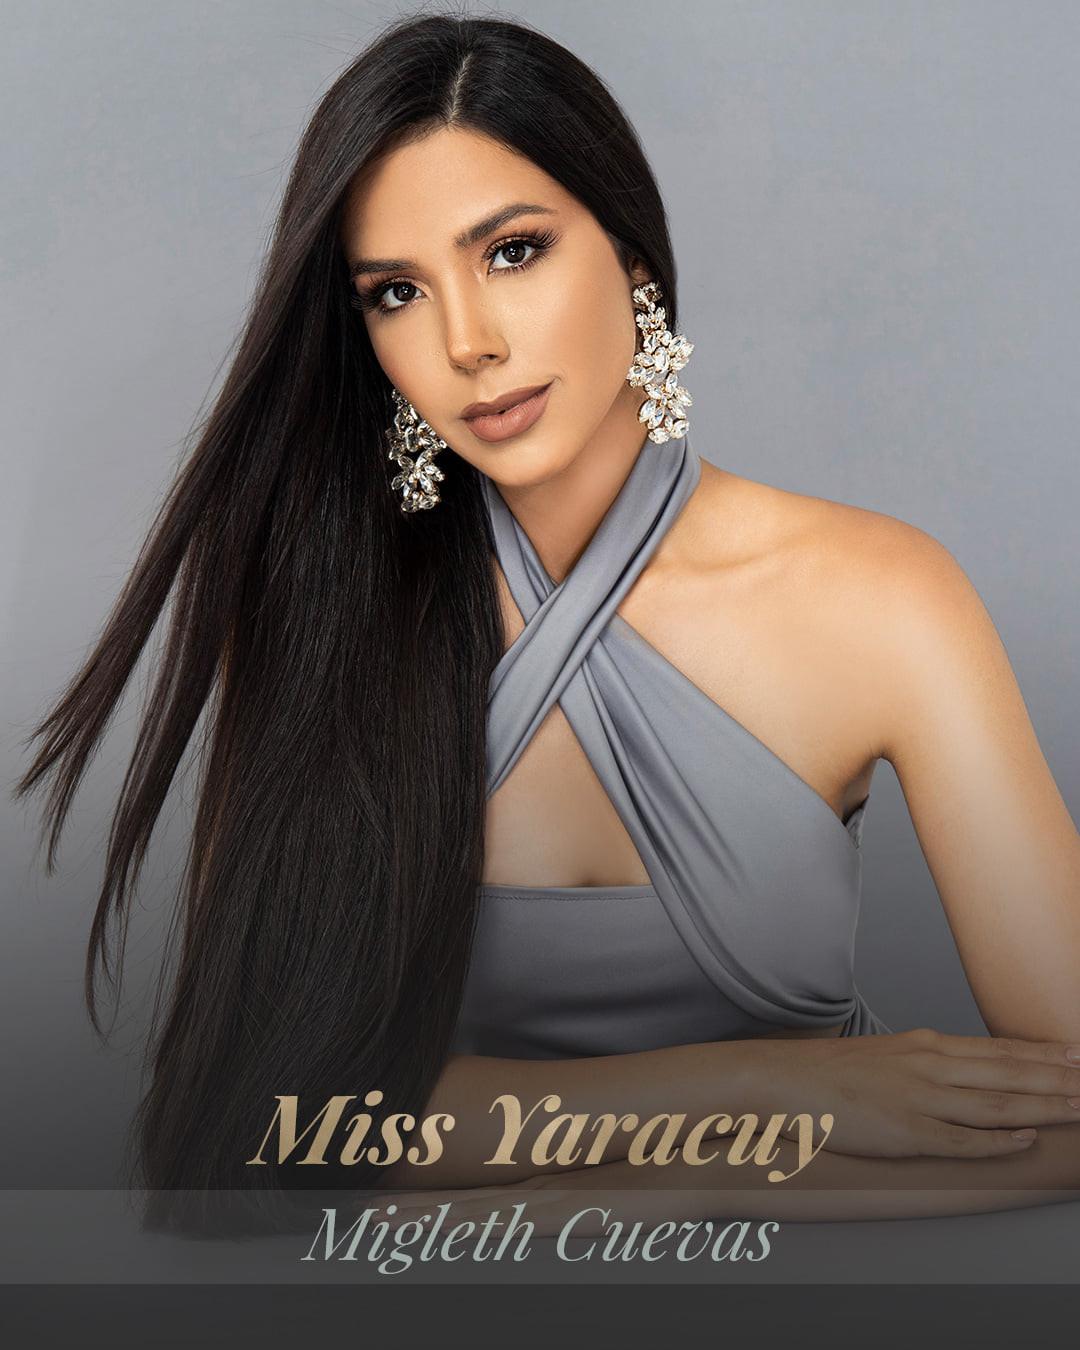 candidatas a miss venezuela 2021. final: 28 oct. - Página 2 RVKEoG